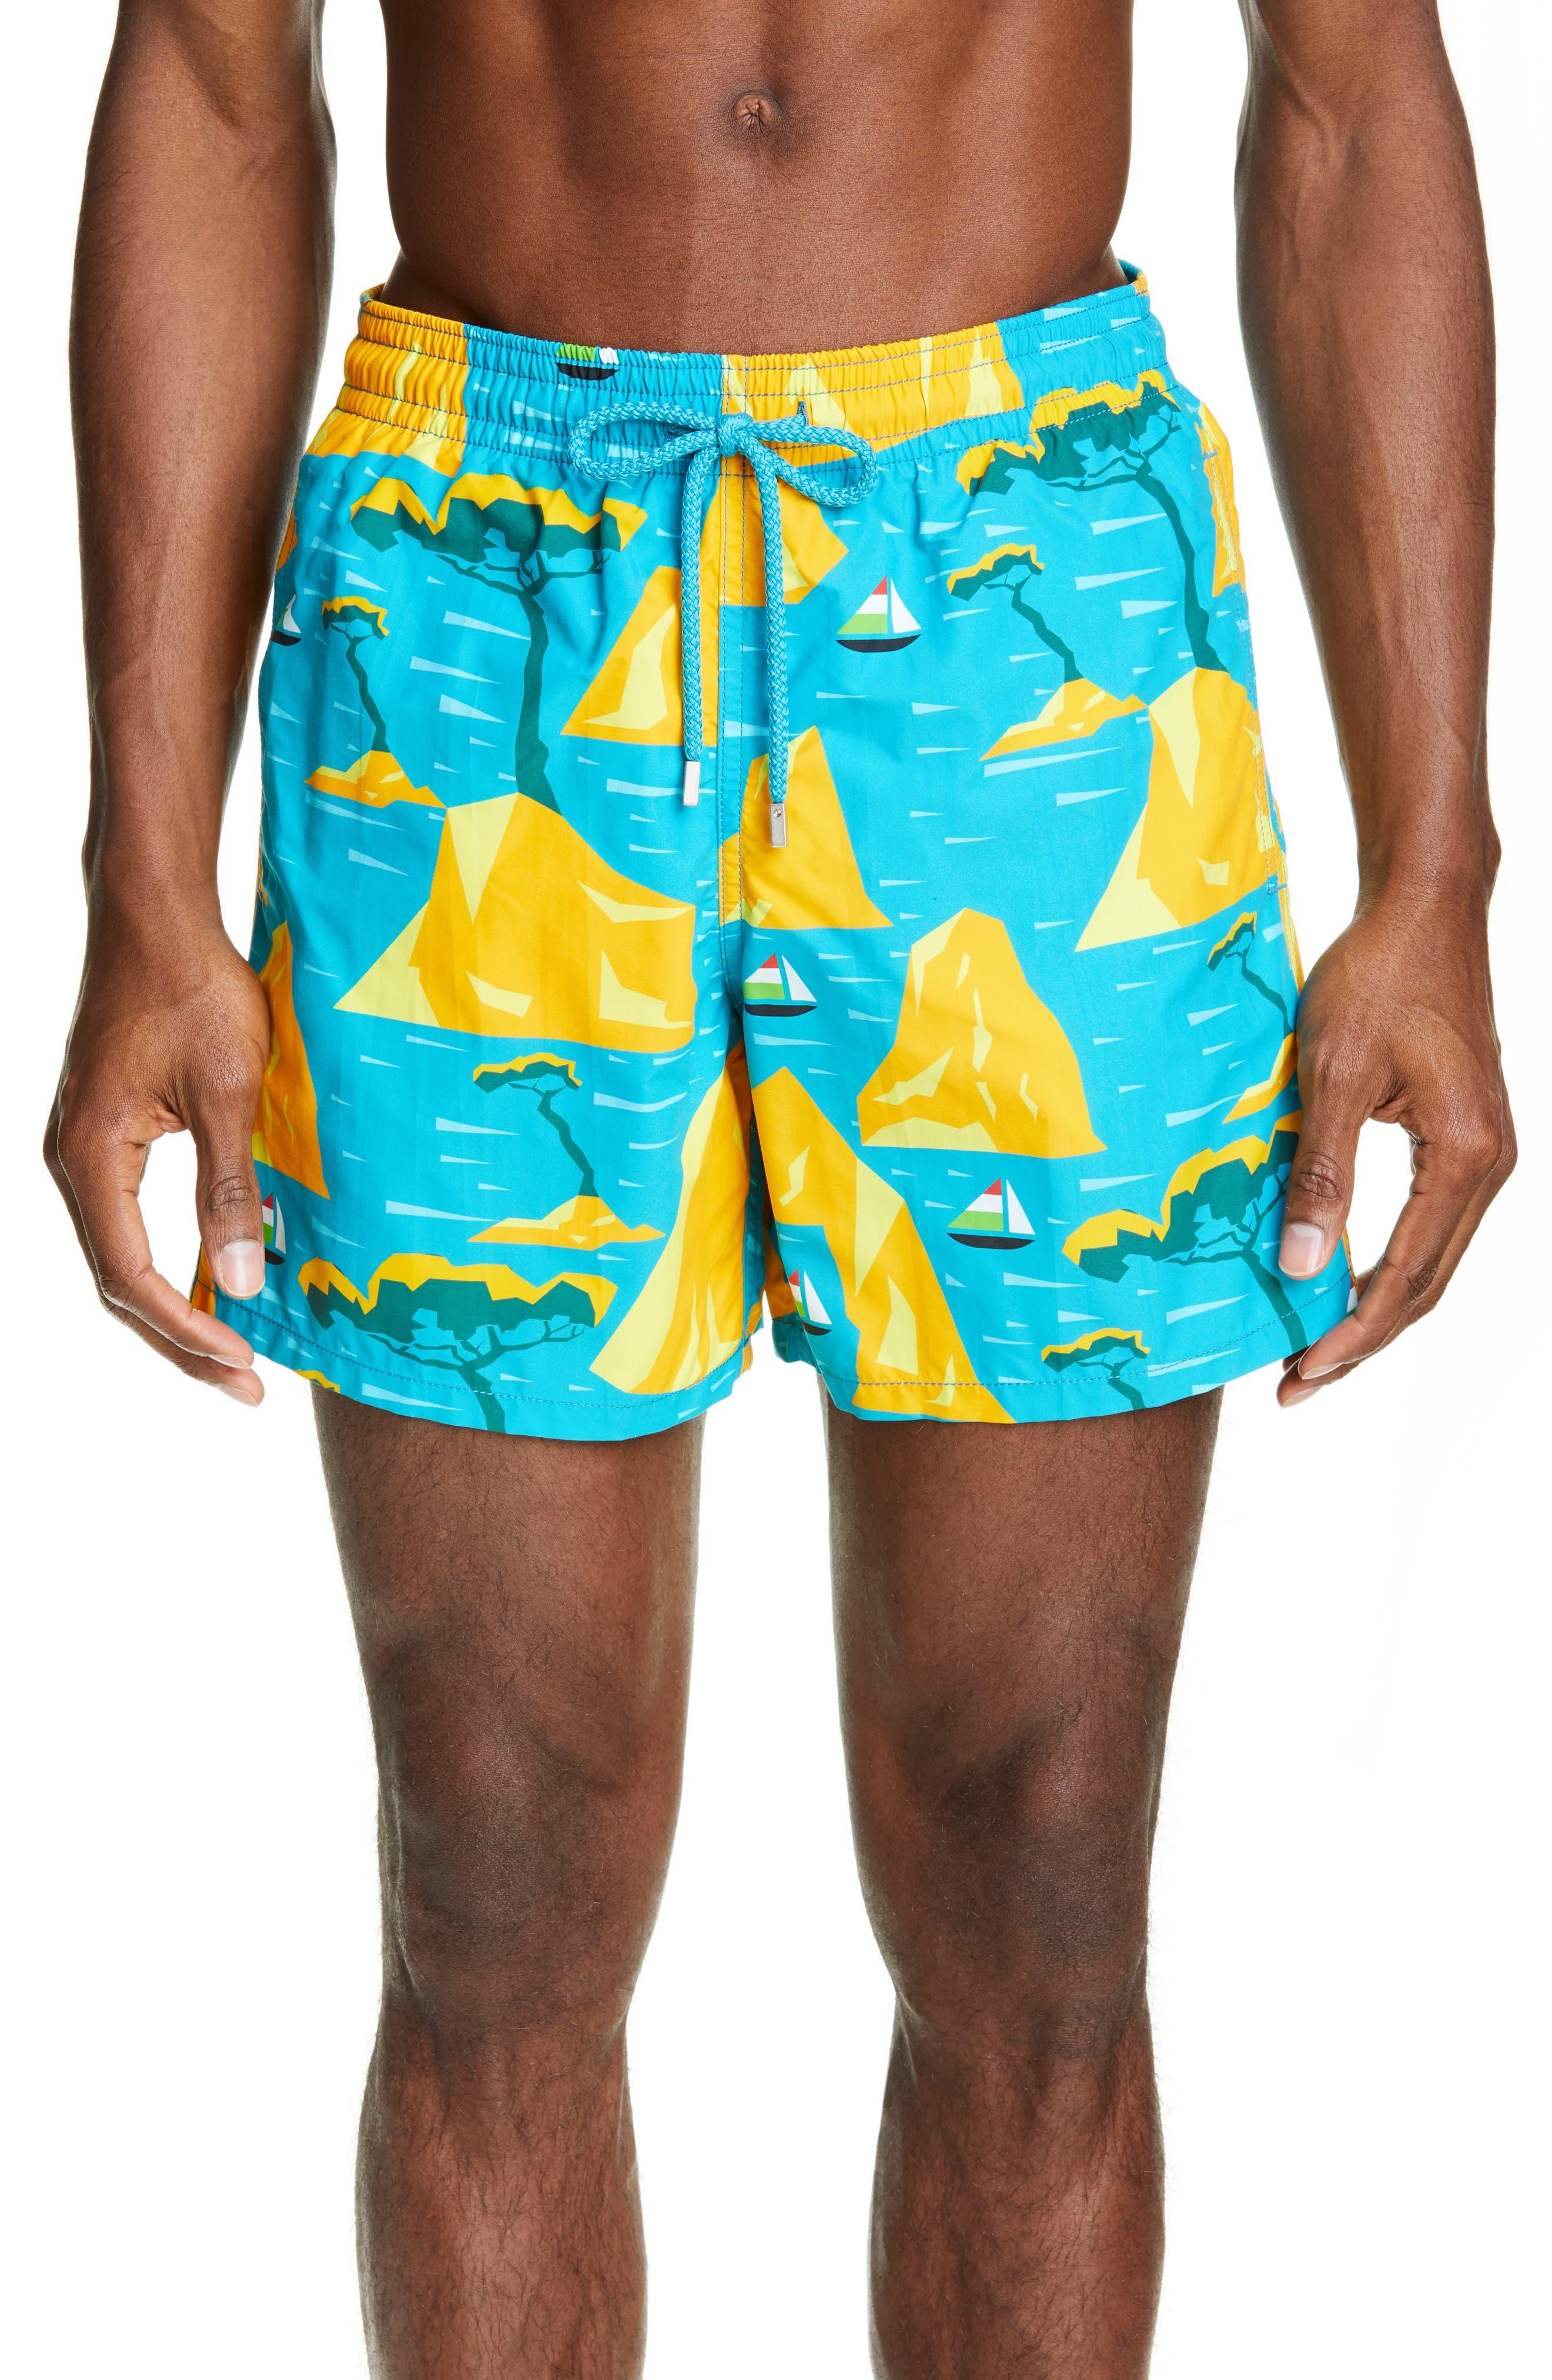 Vilebrequin Capri Swim Trunks, Blue/green